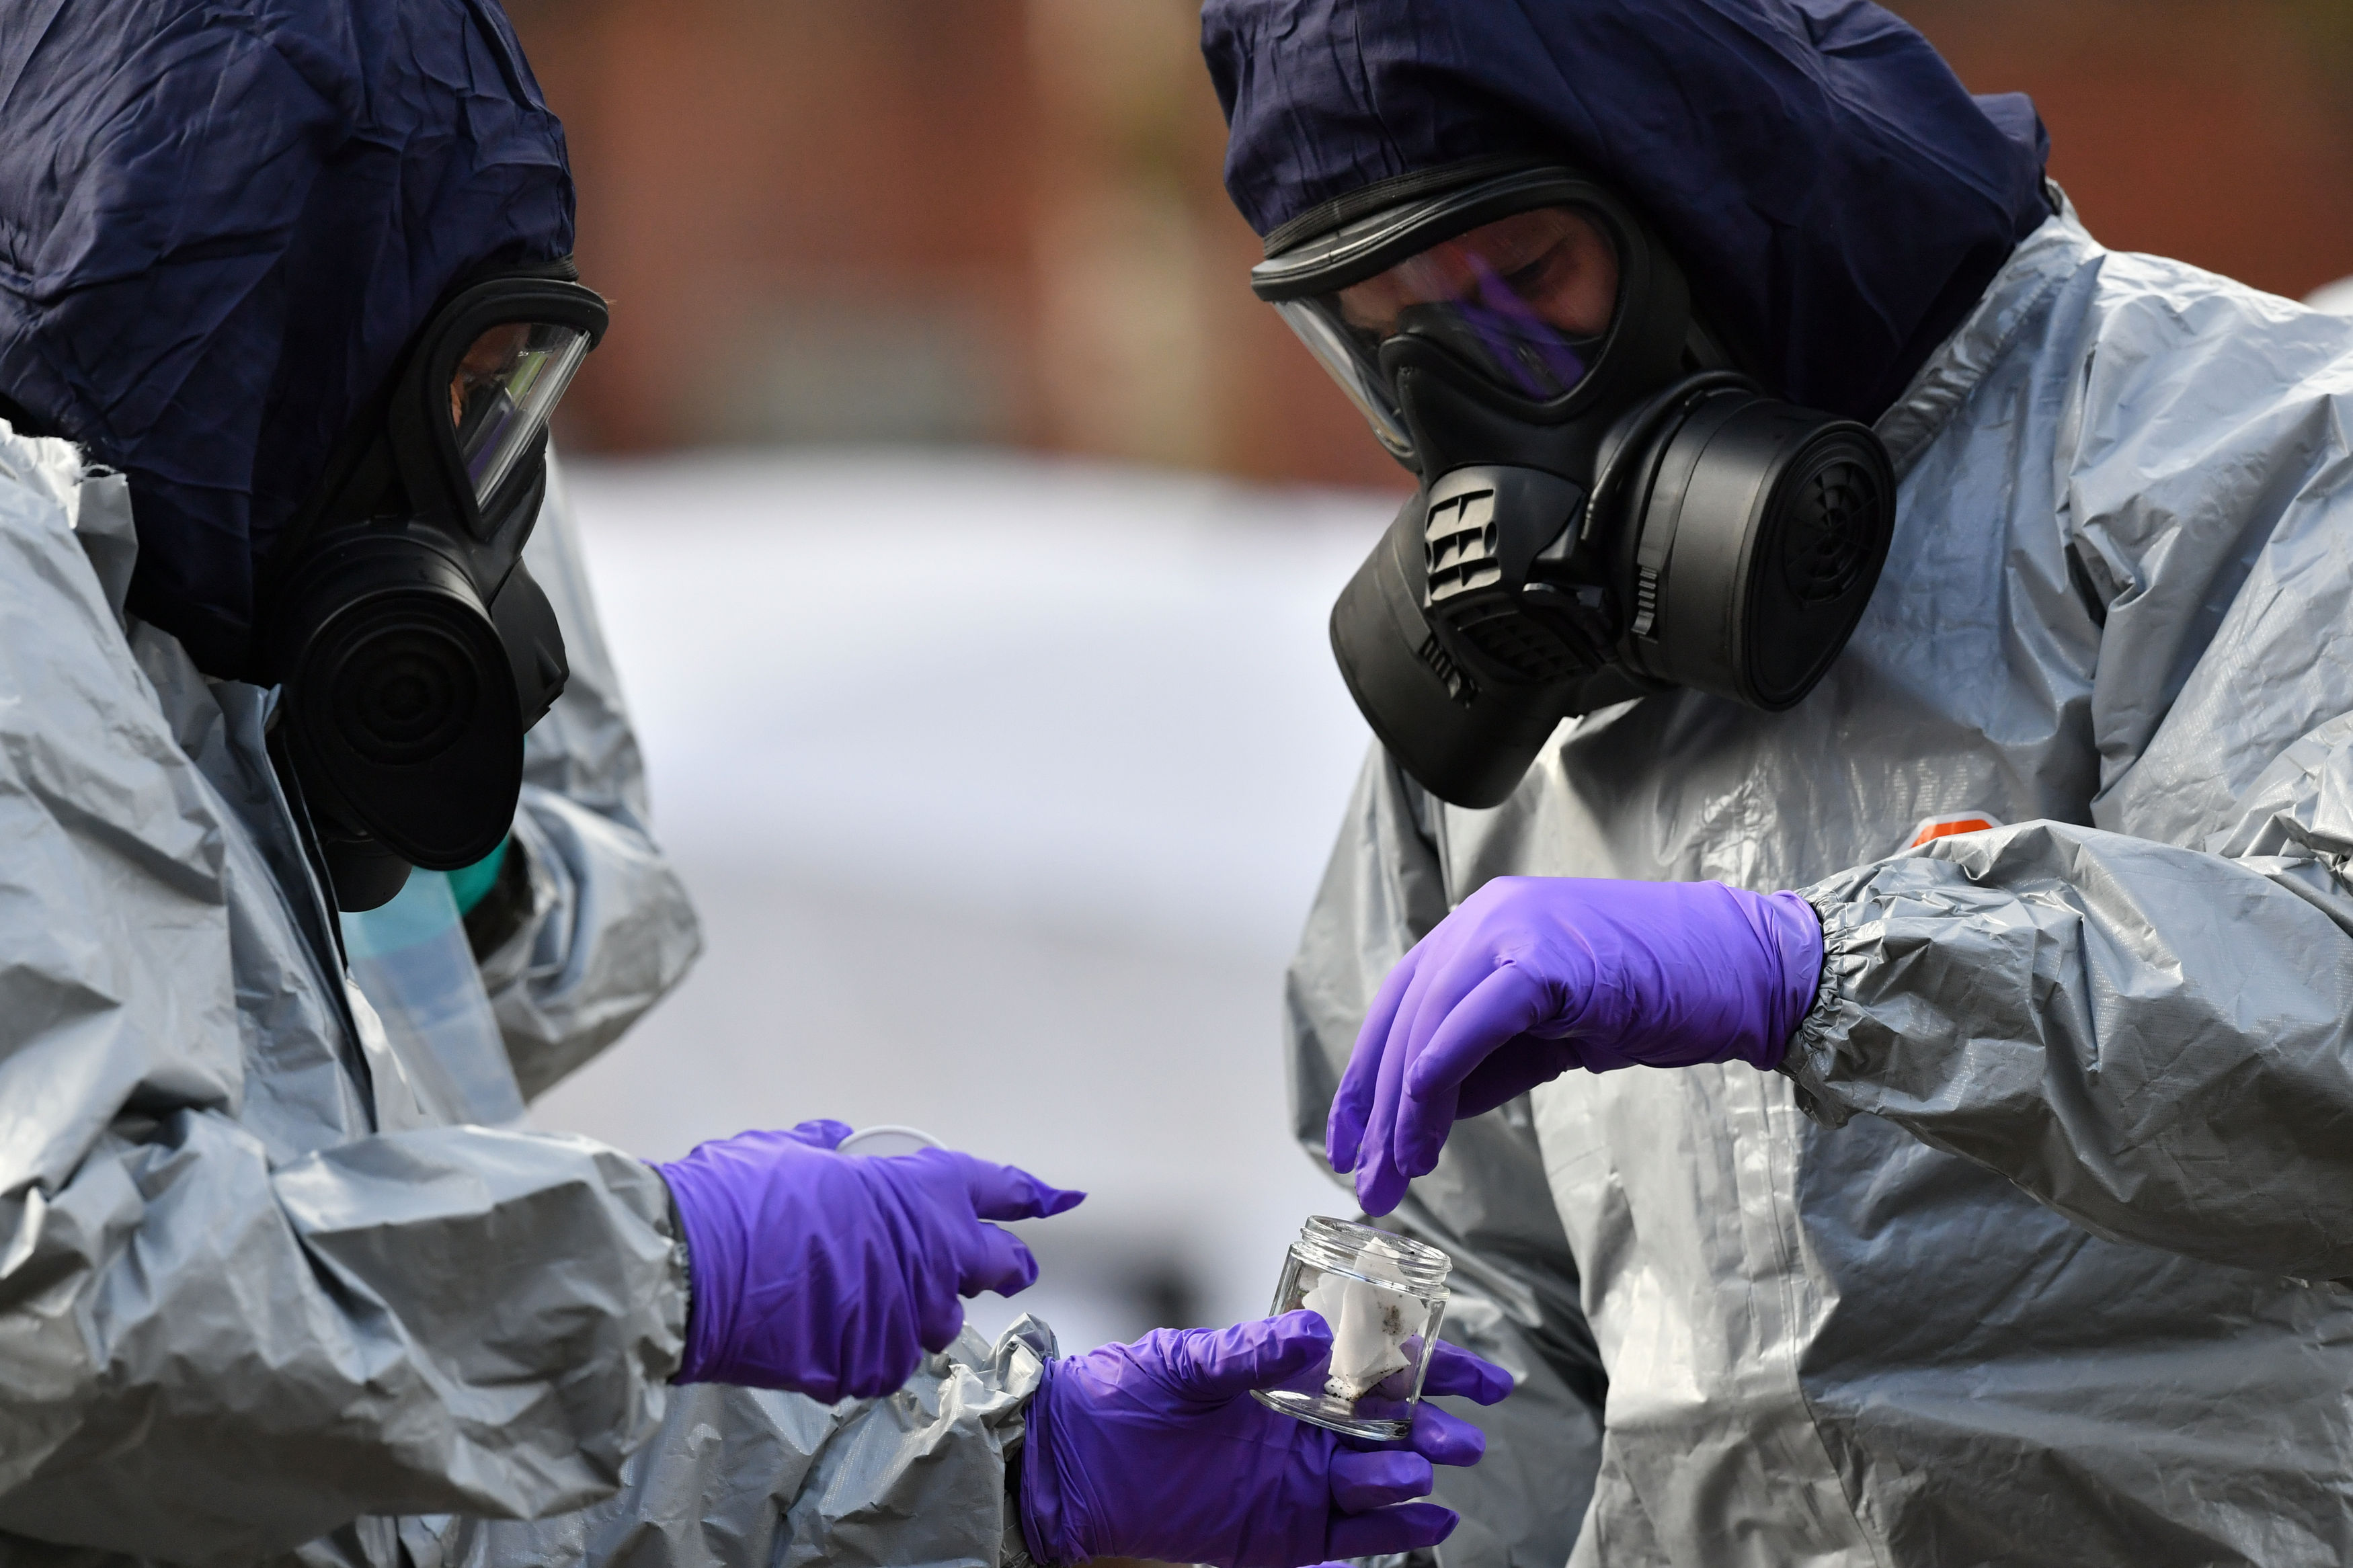 Police investigate the nerve agent attack (Ben Birchall/PA Wire)